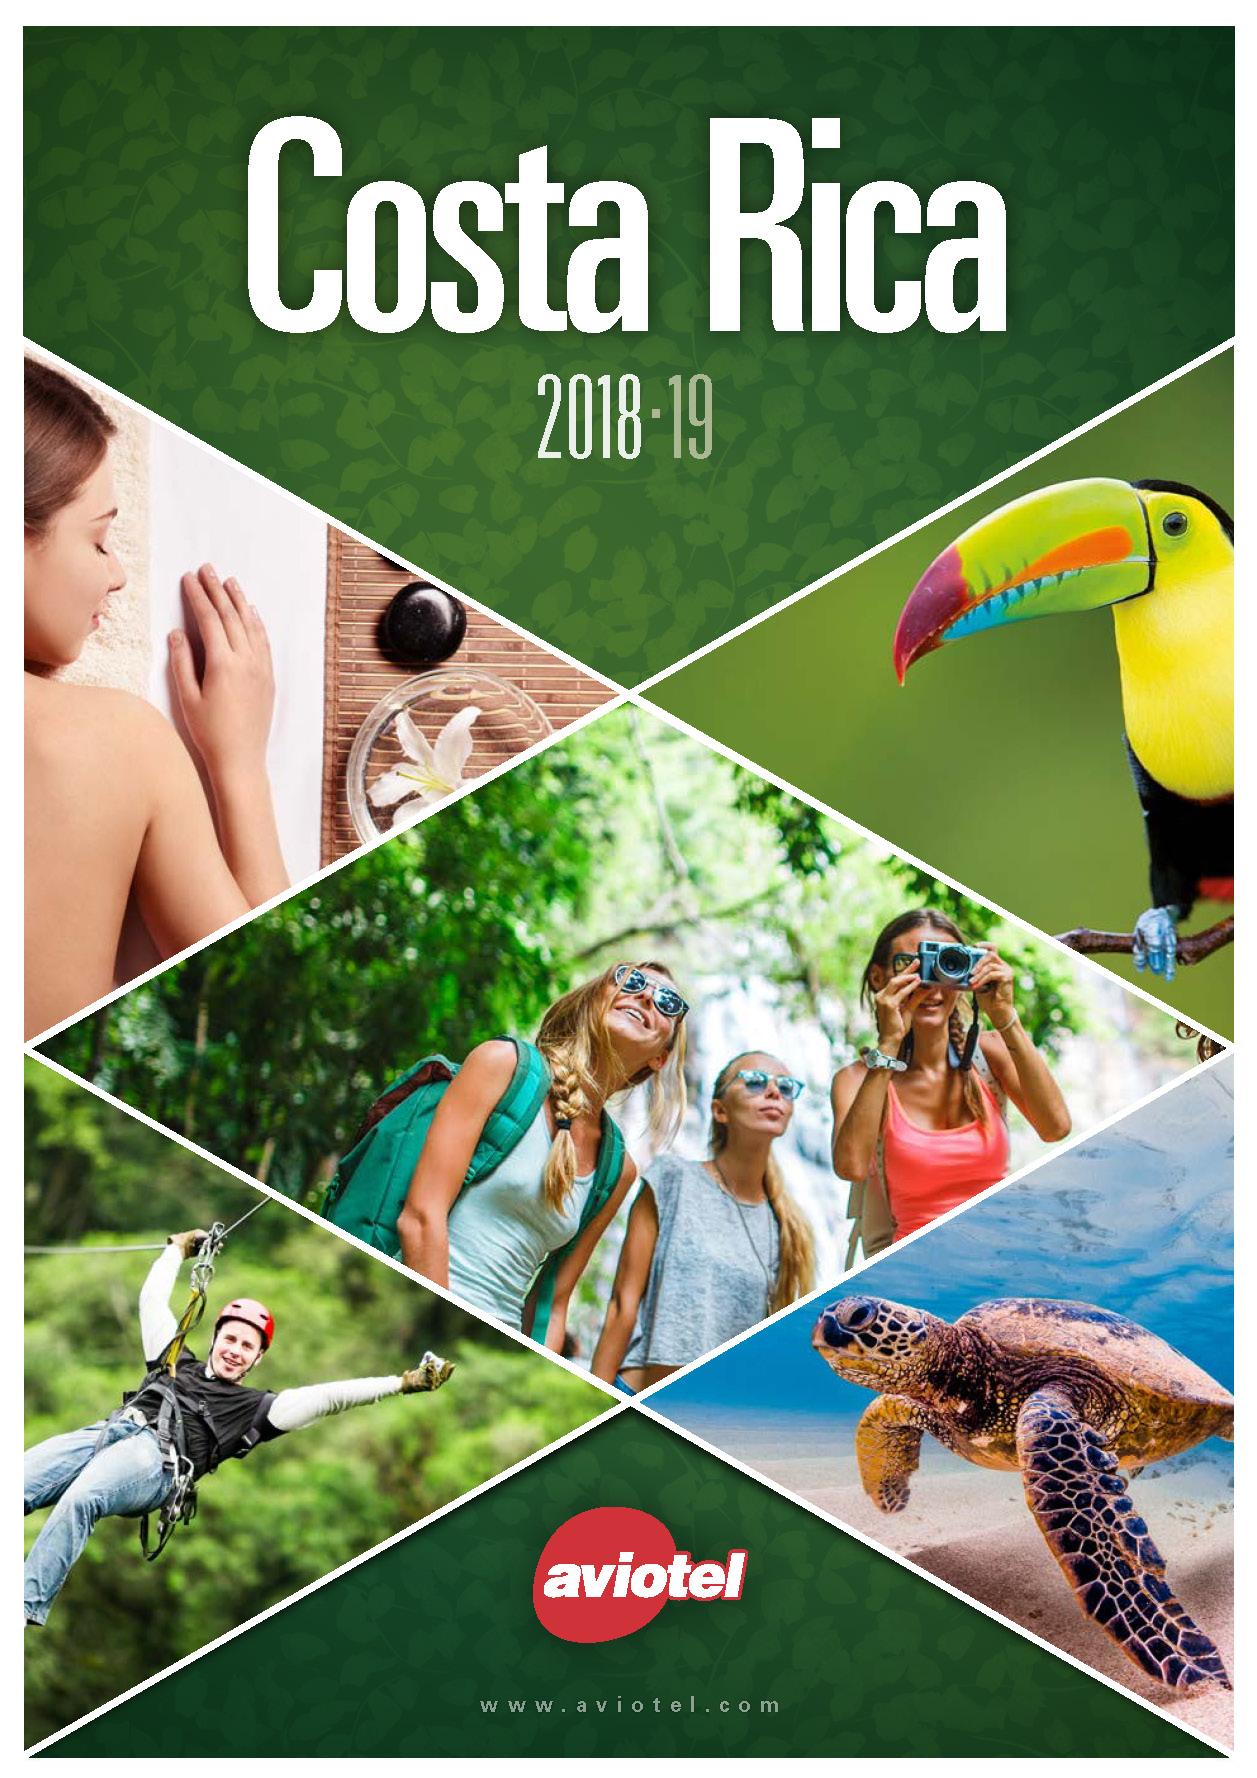 Catalogo Aviotel Costa Rica 2018-2019